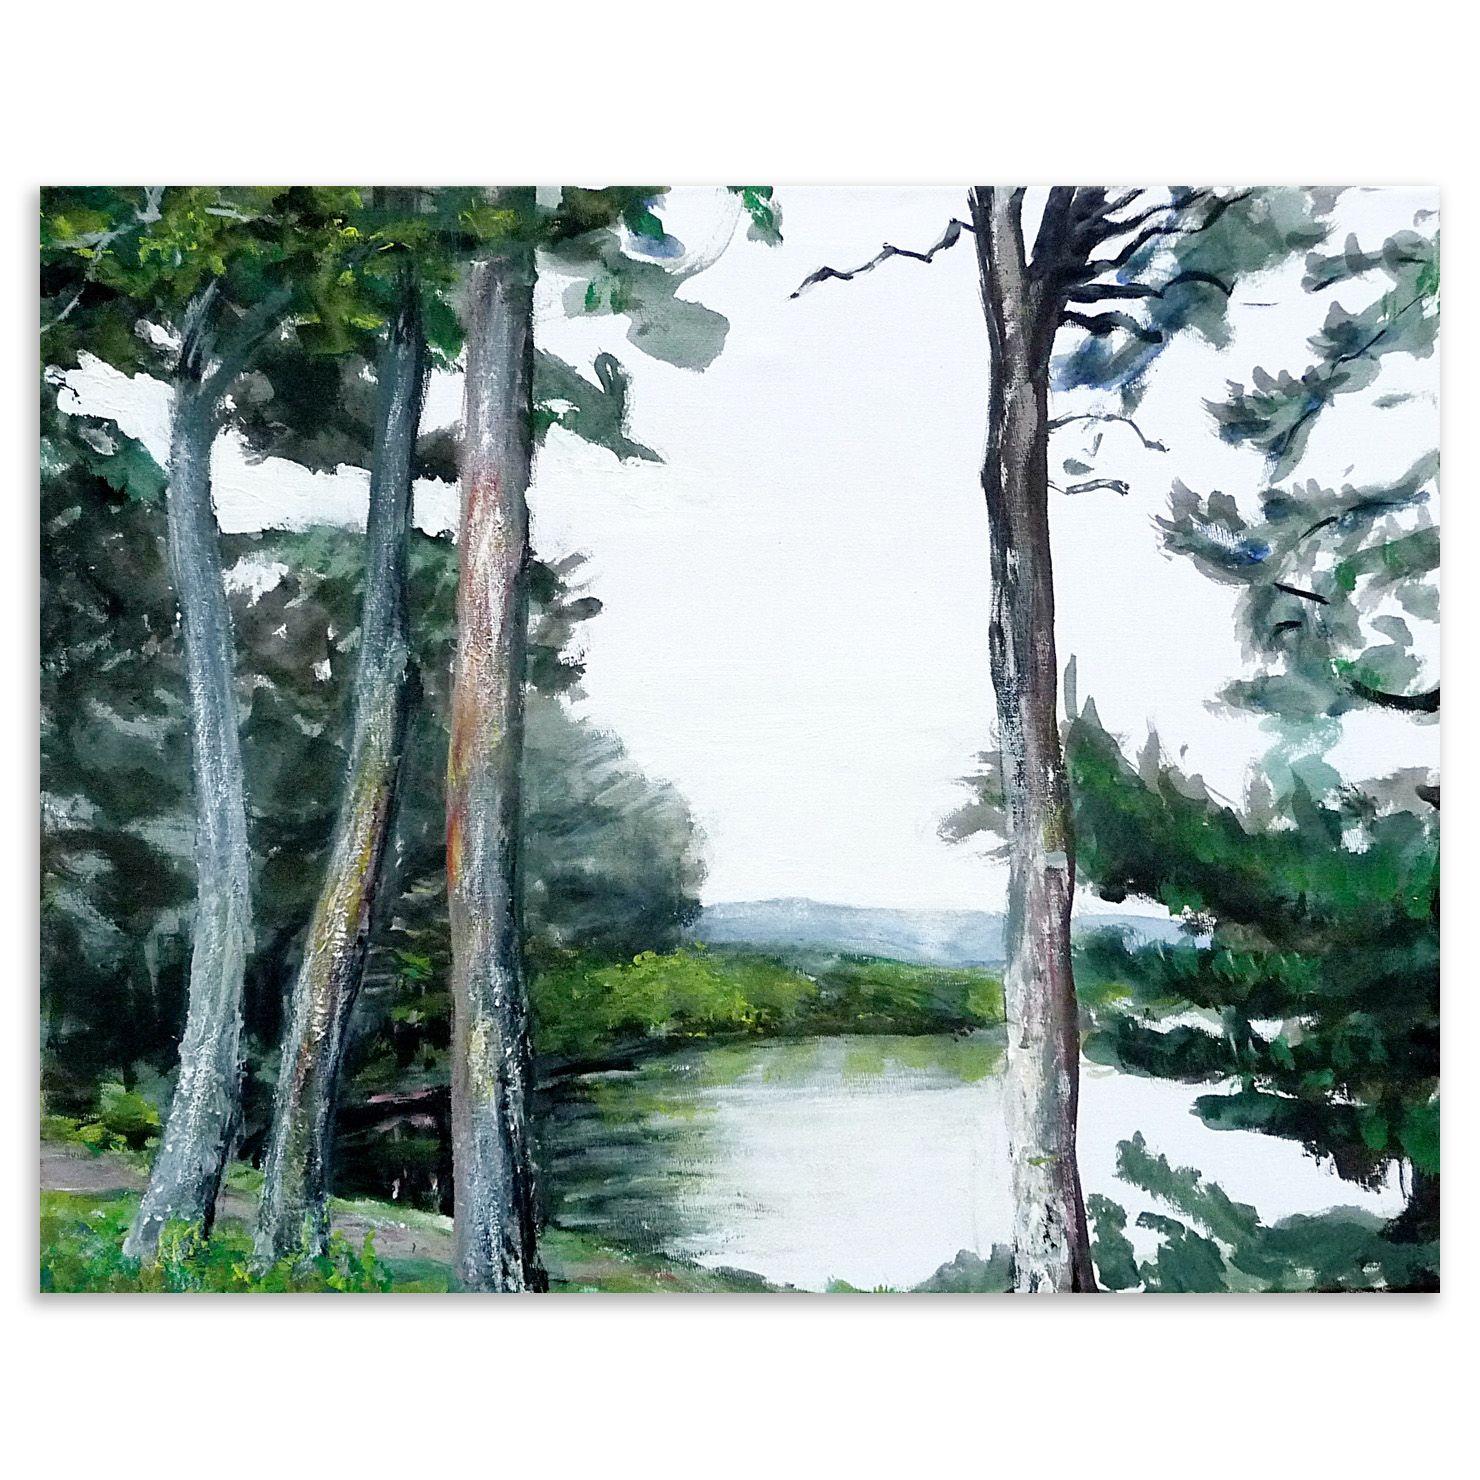 Rose Strang - Reservoir Pentlands, Acrylic on Canvas, 50x40cm